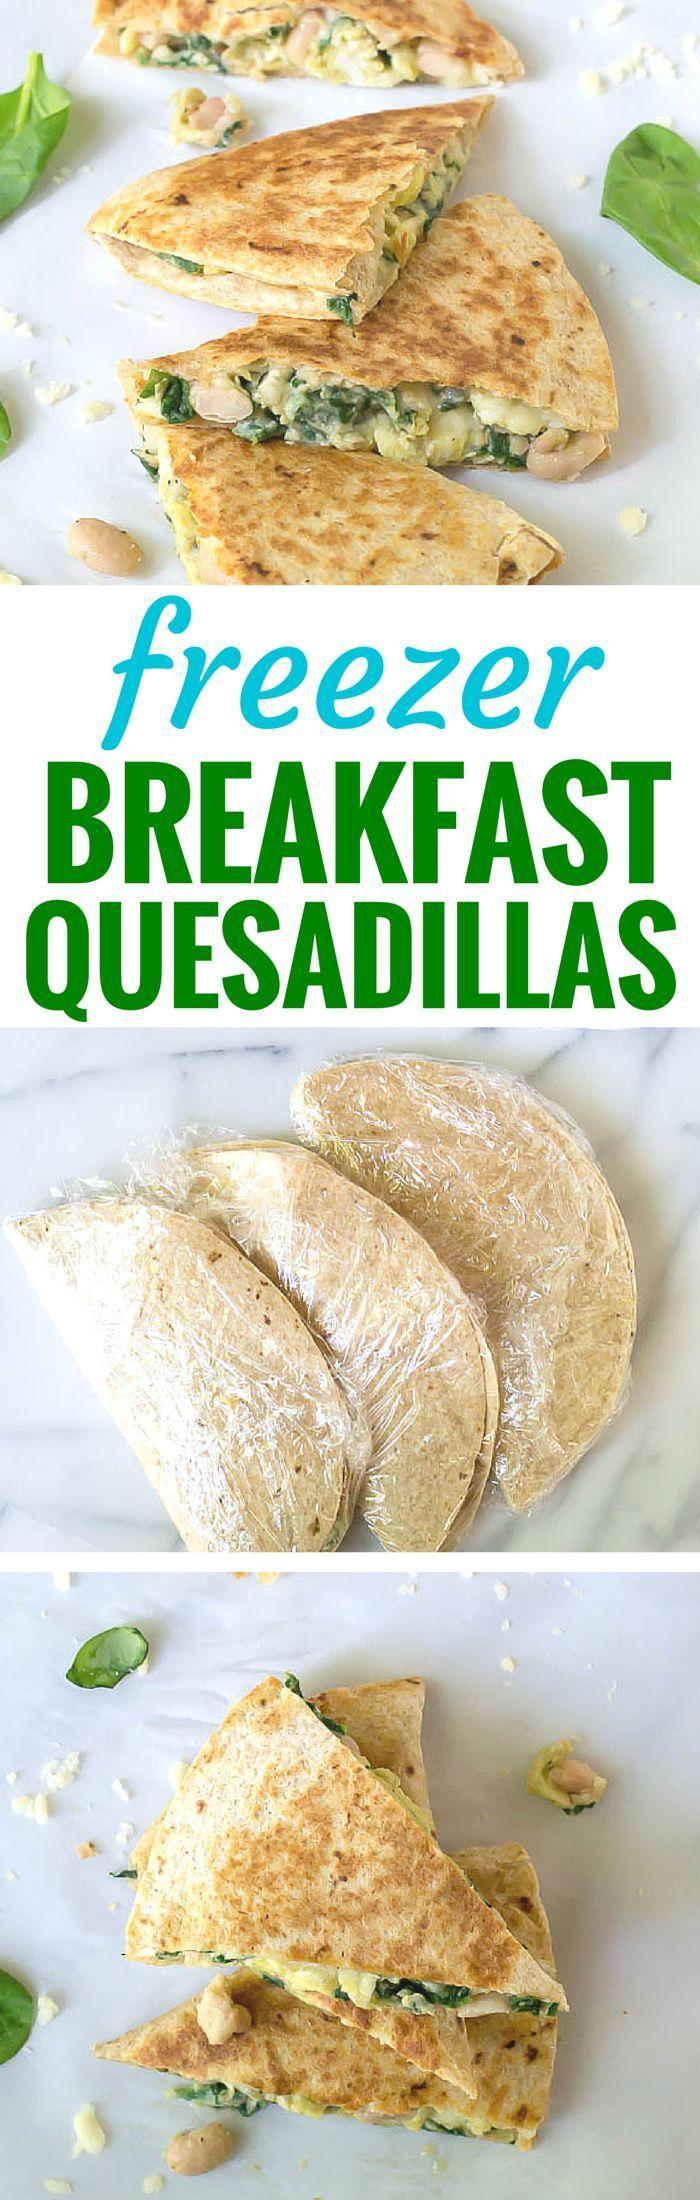 Freezer Breakfast Quesadilla